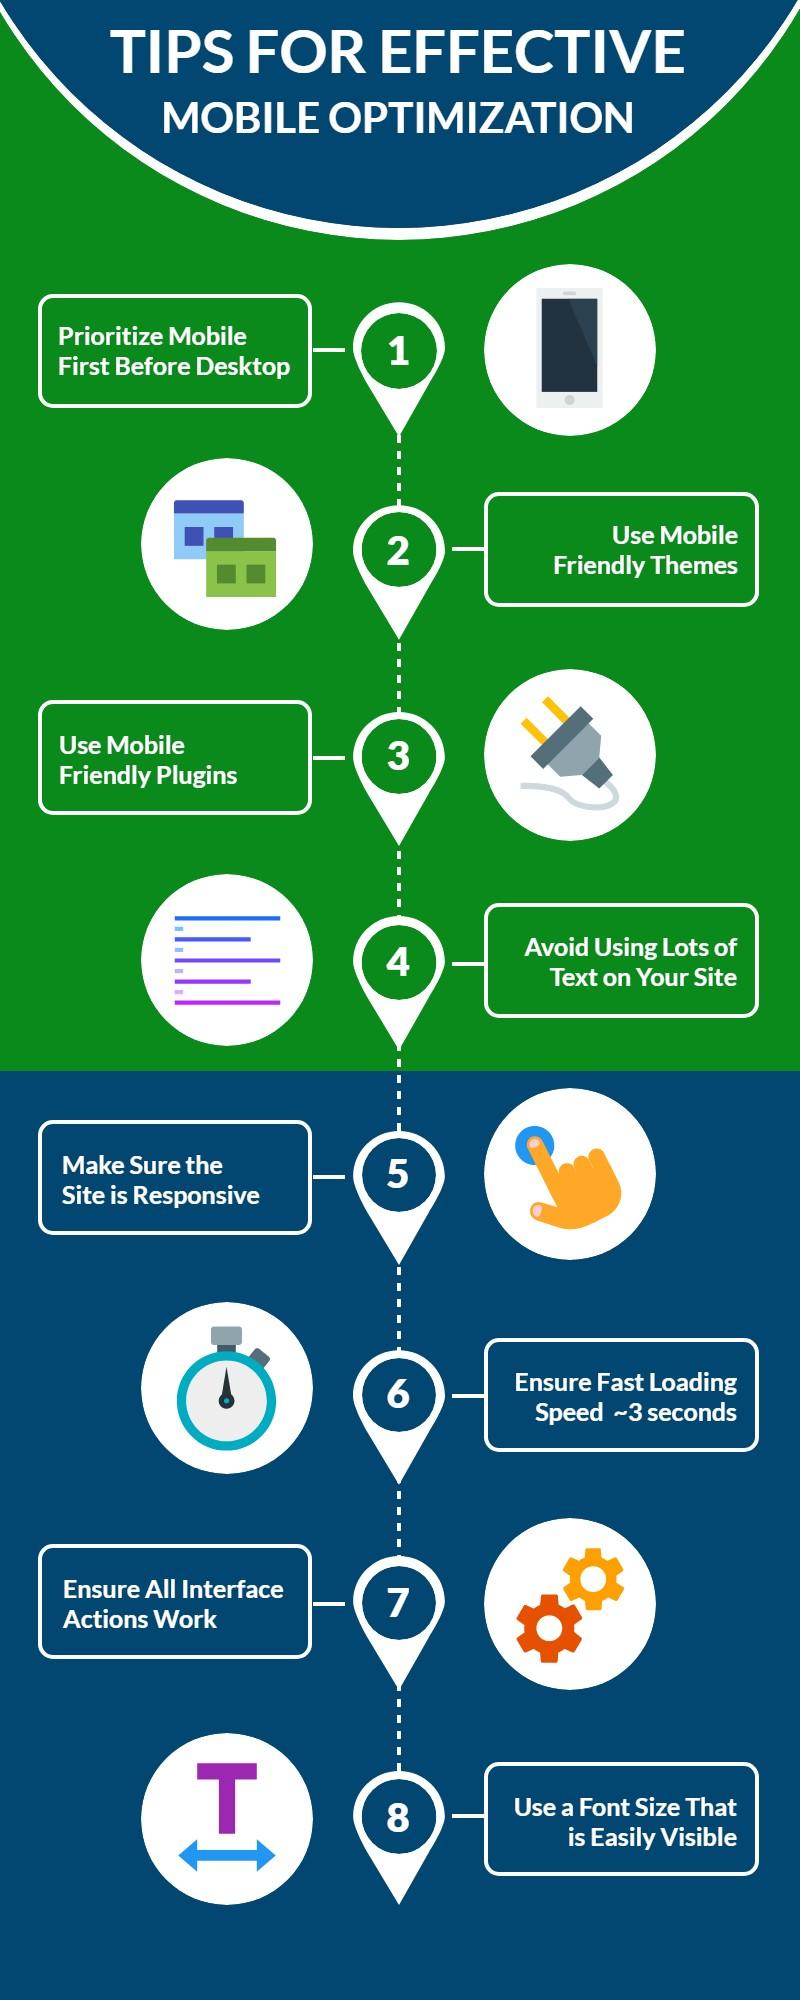 Tips for effective mobile optimization | WSI Ottawa